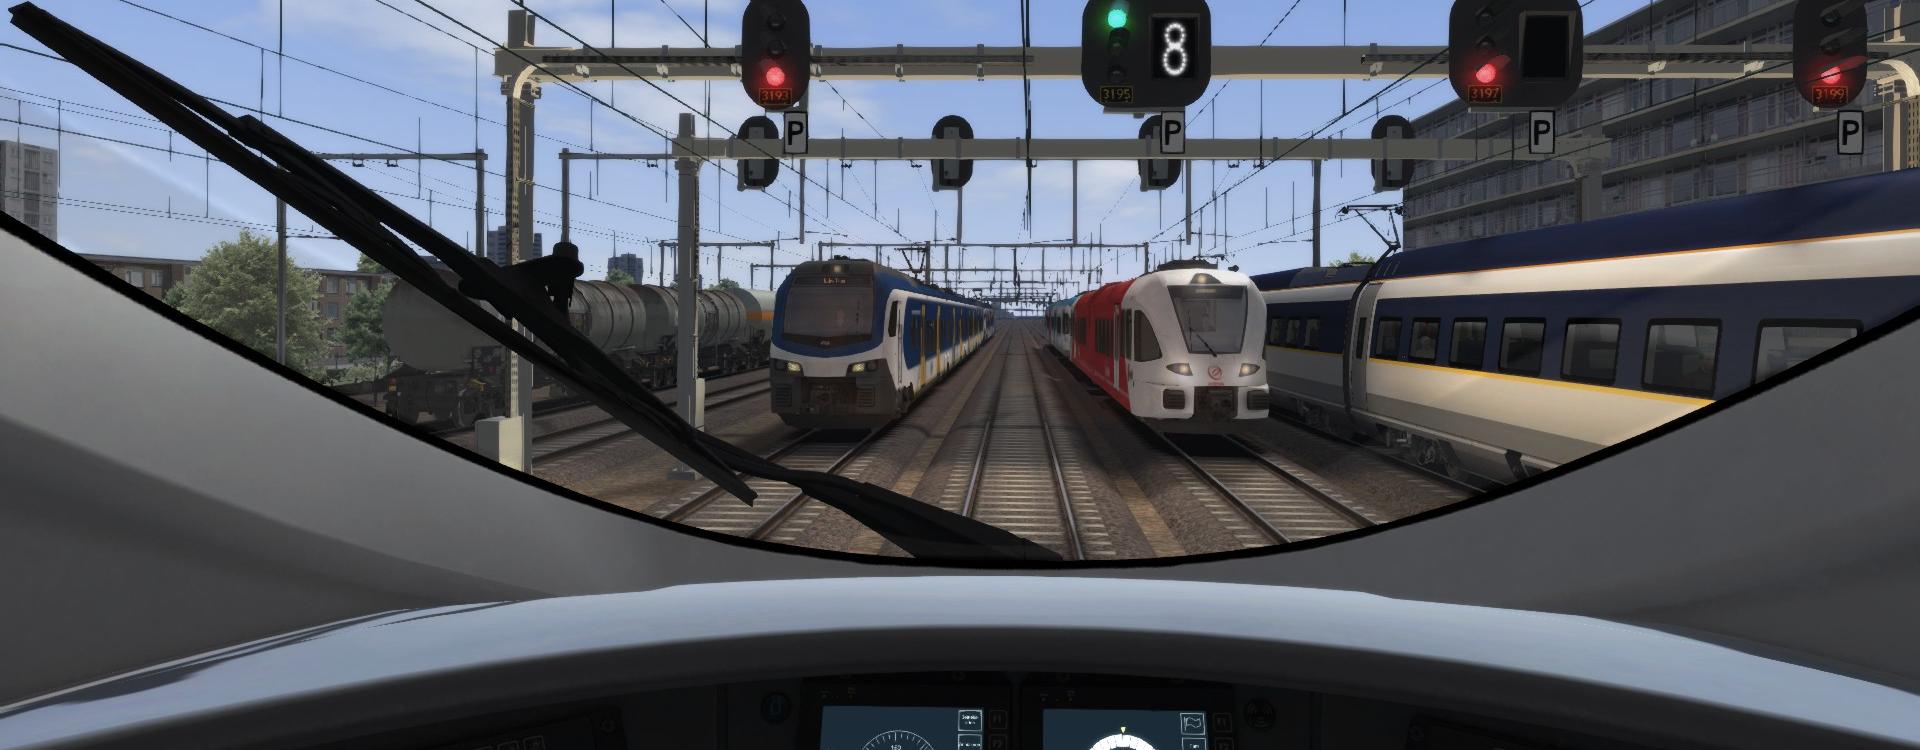 It's busy at Krammendijk Centraal!